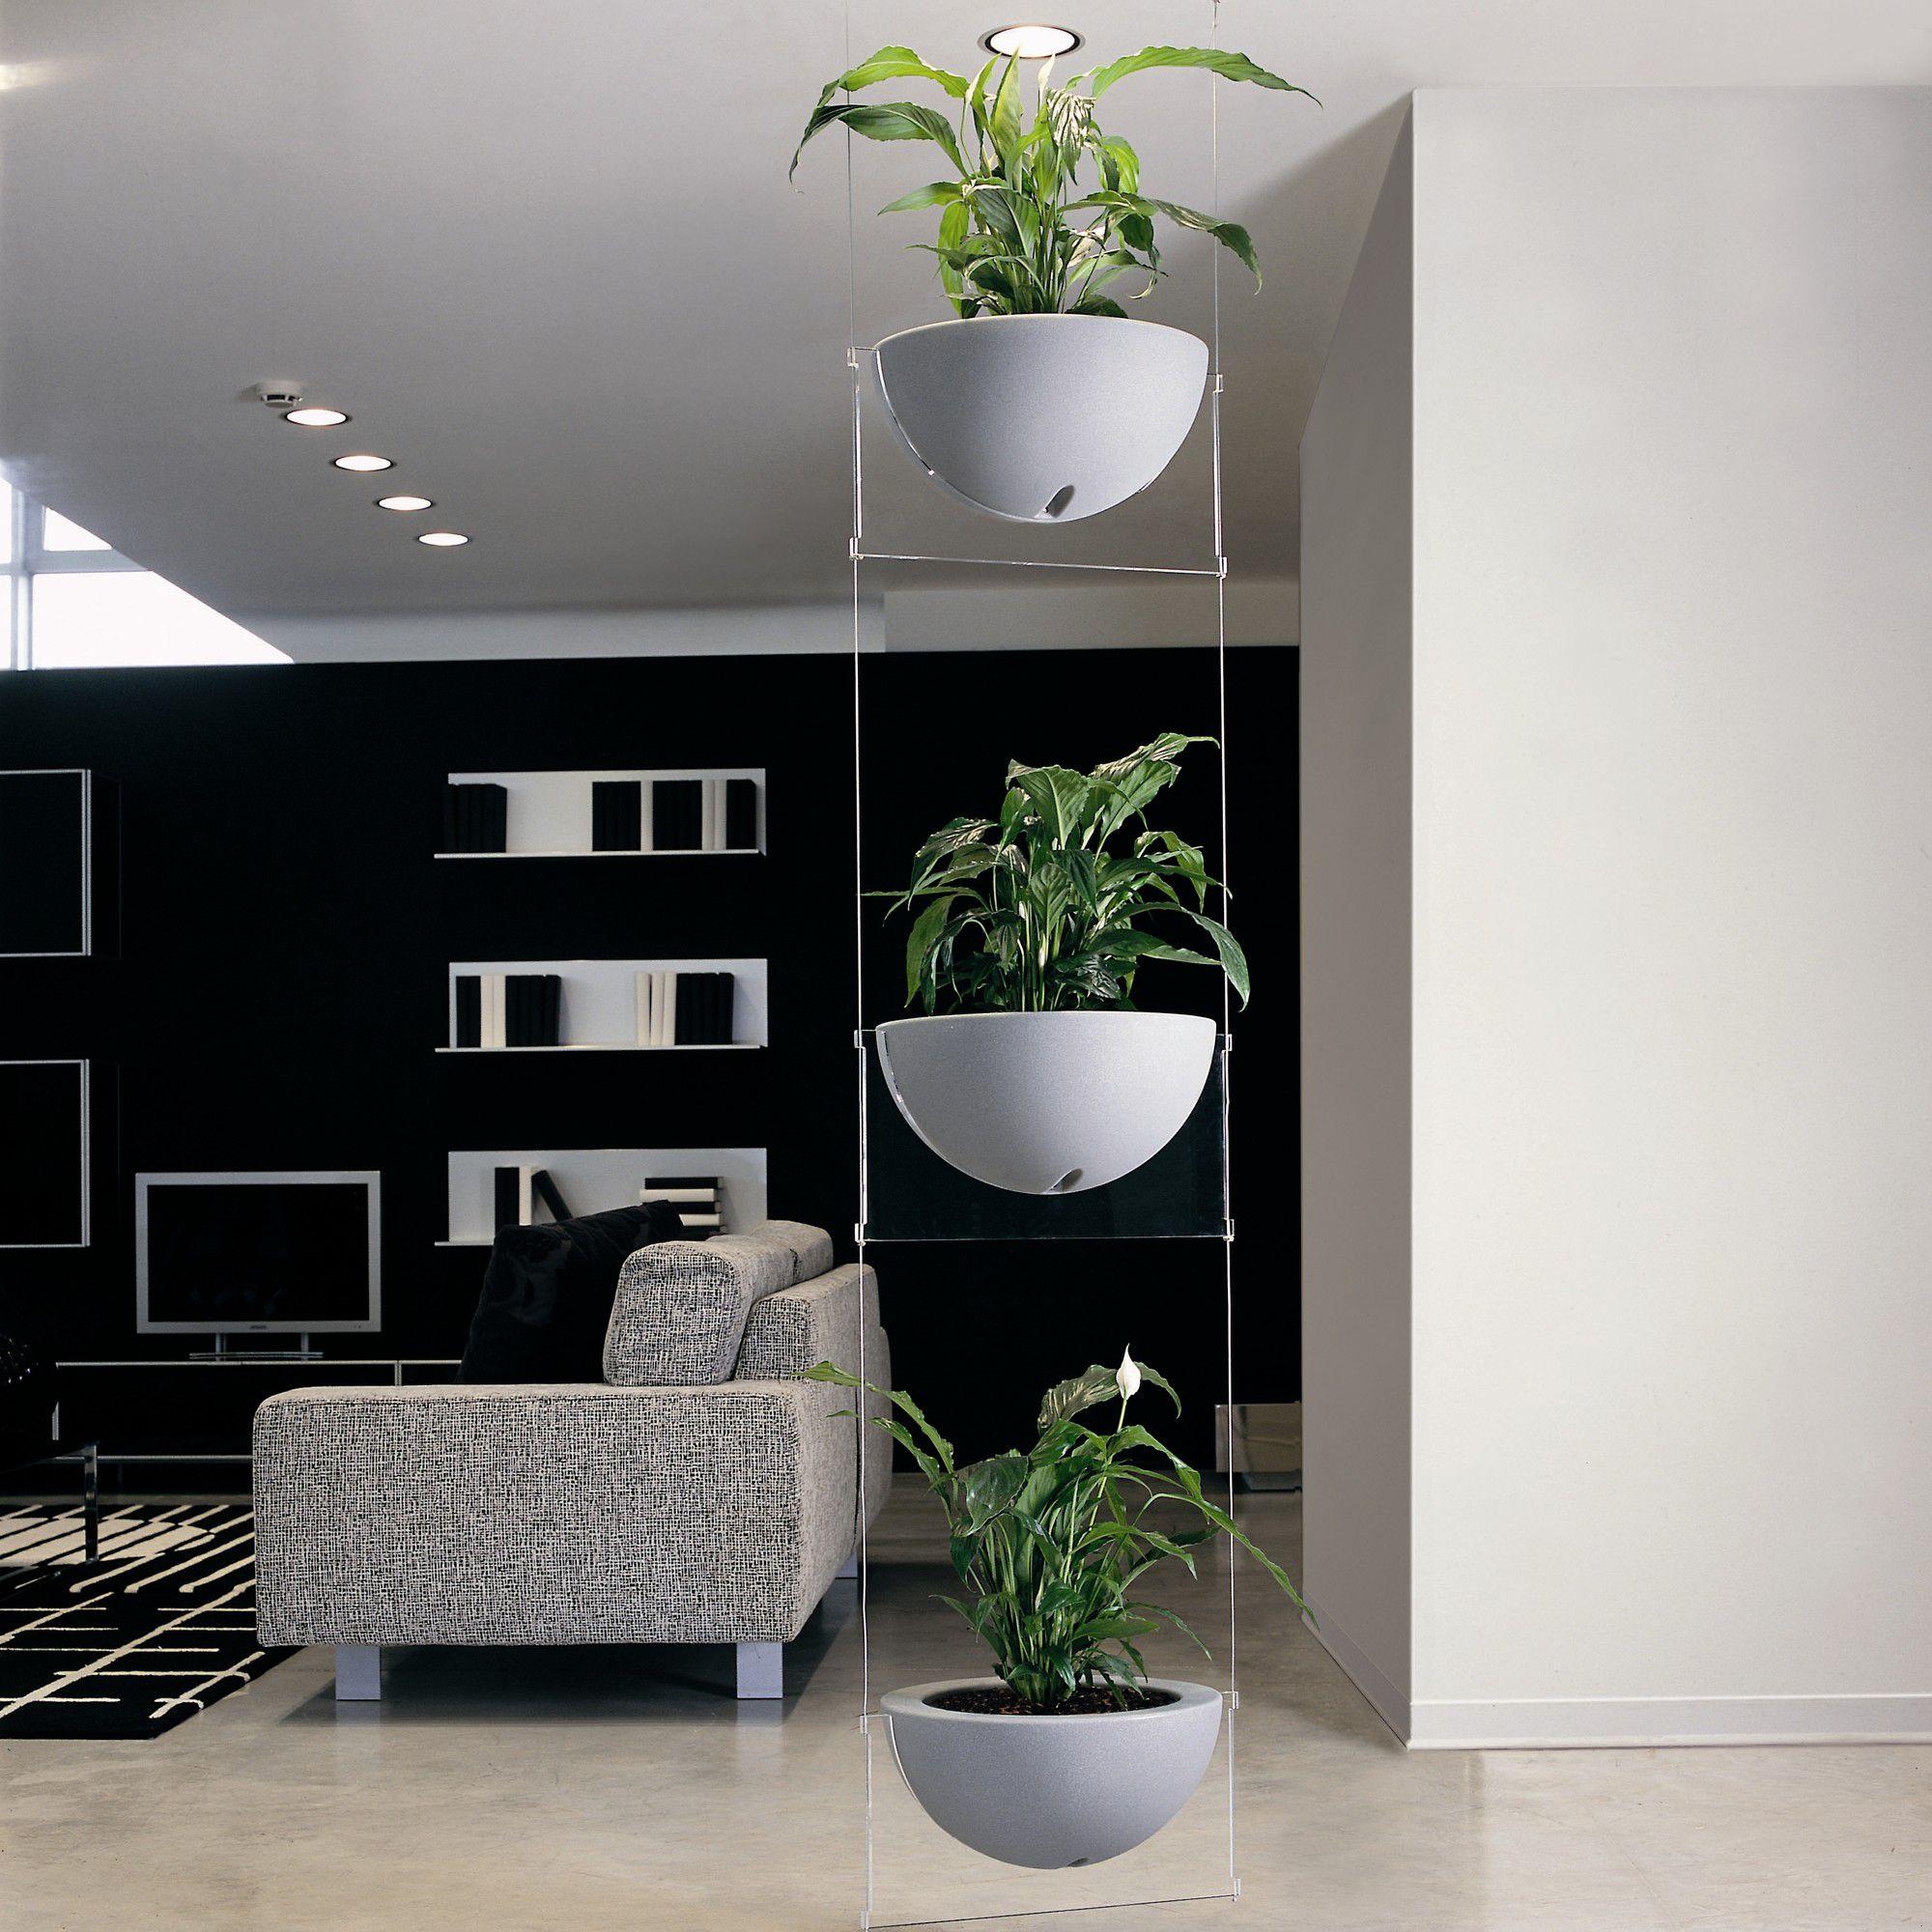 Emporium Positive Design Eebavoglio Triple Flower Tray - Grey at Tesco Direct